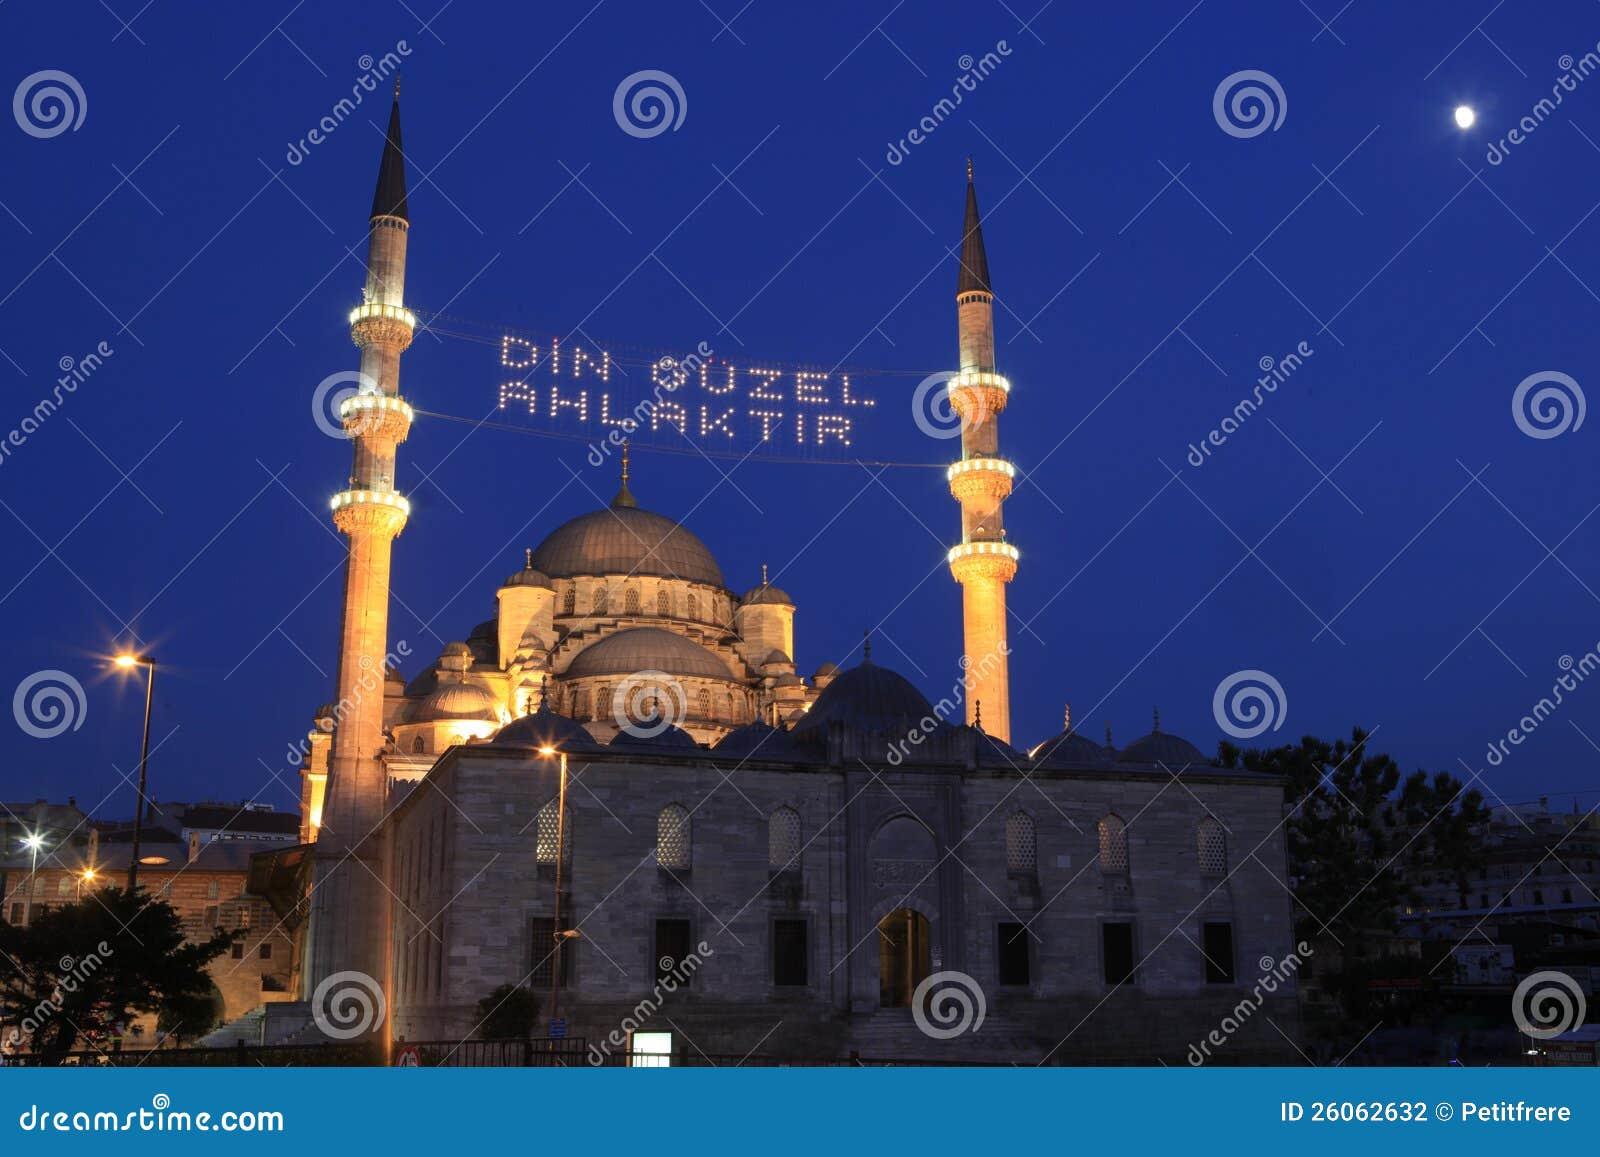 Mosquée neuve dans Ramadan à Istanbul, Turquie